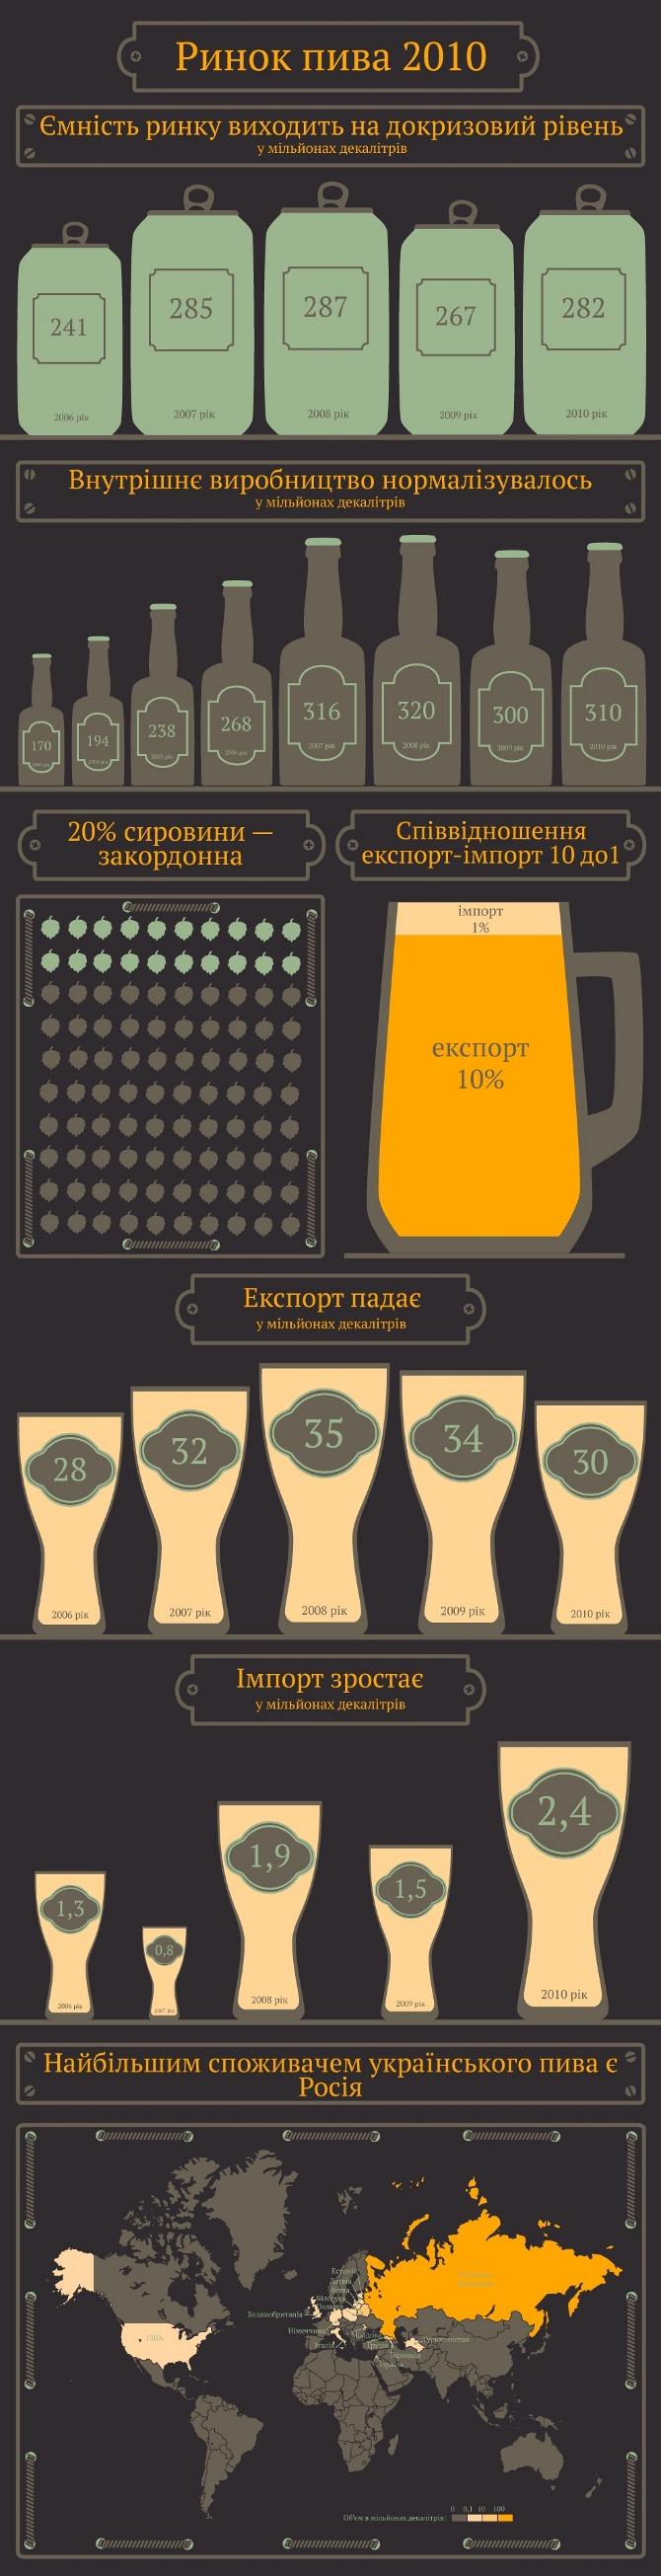 Pivo-ukraine